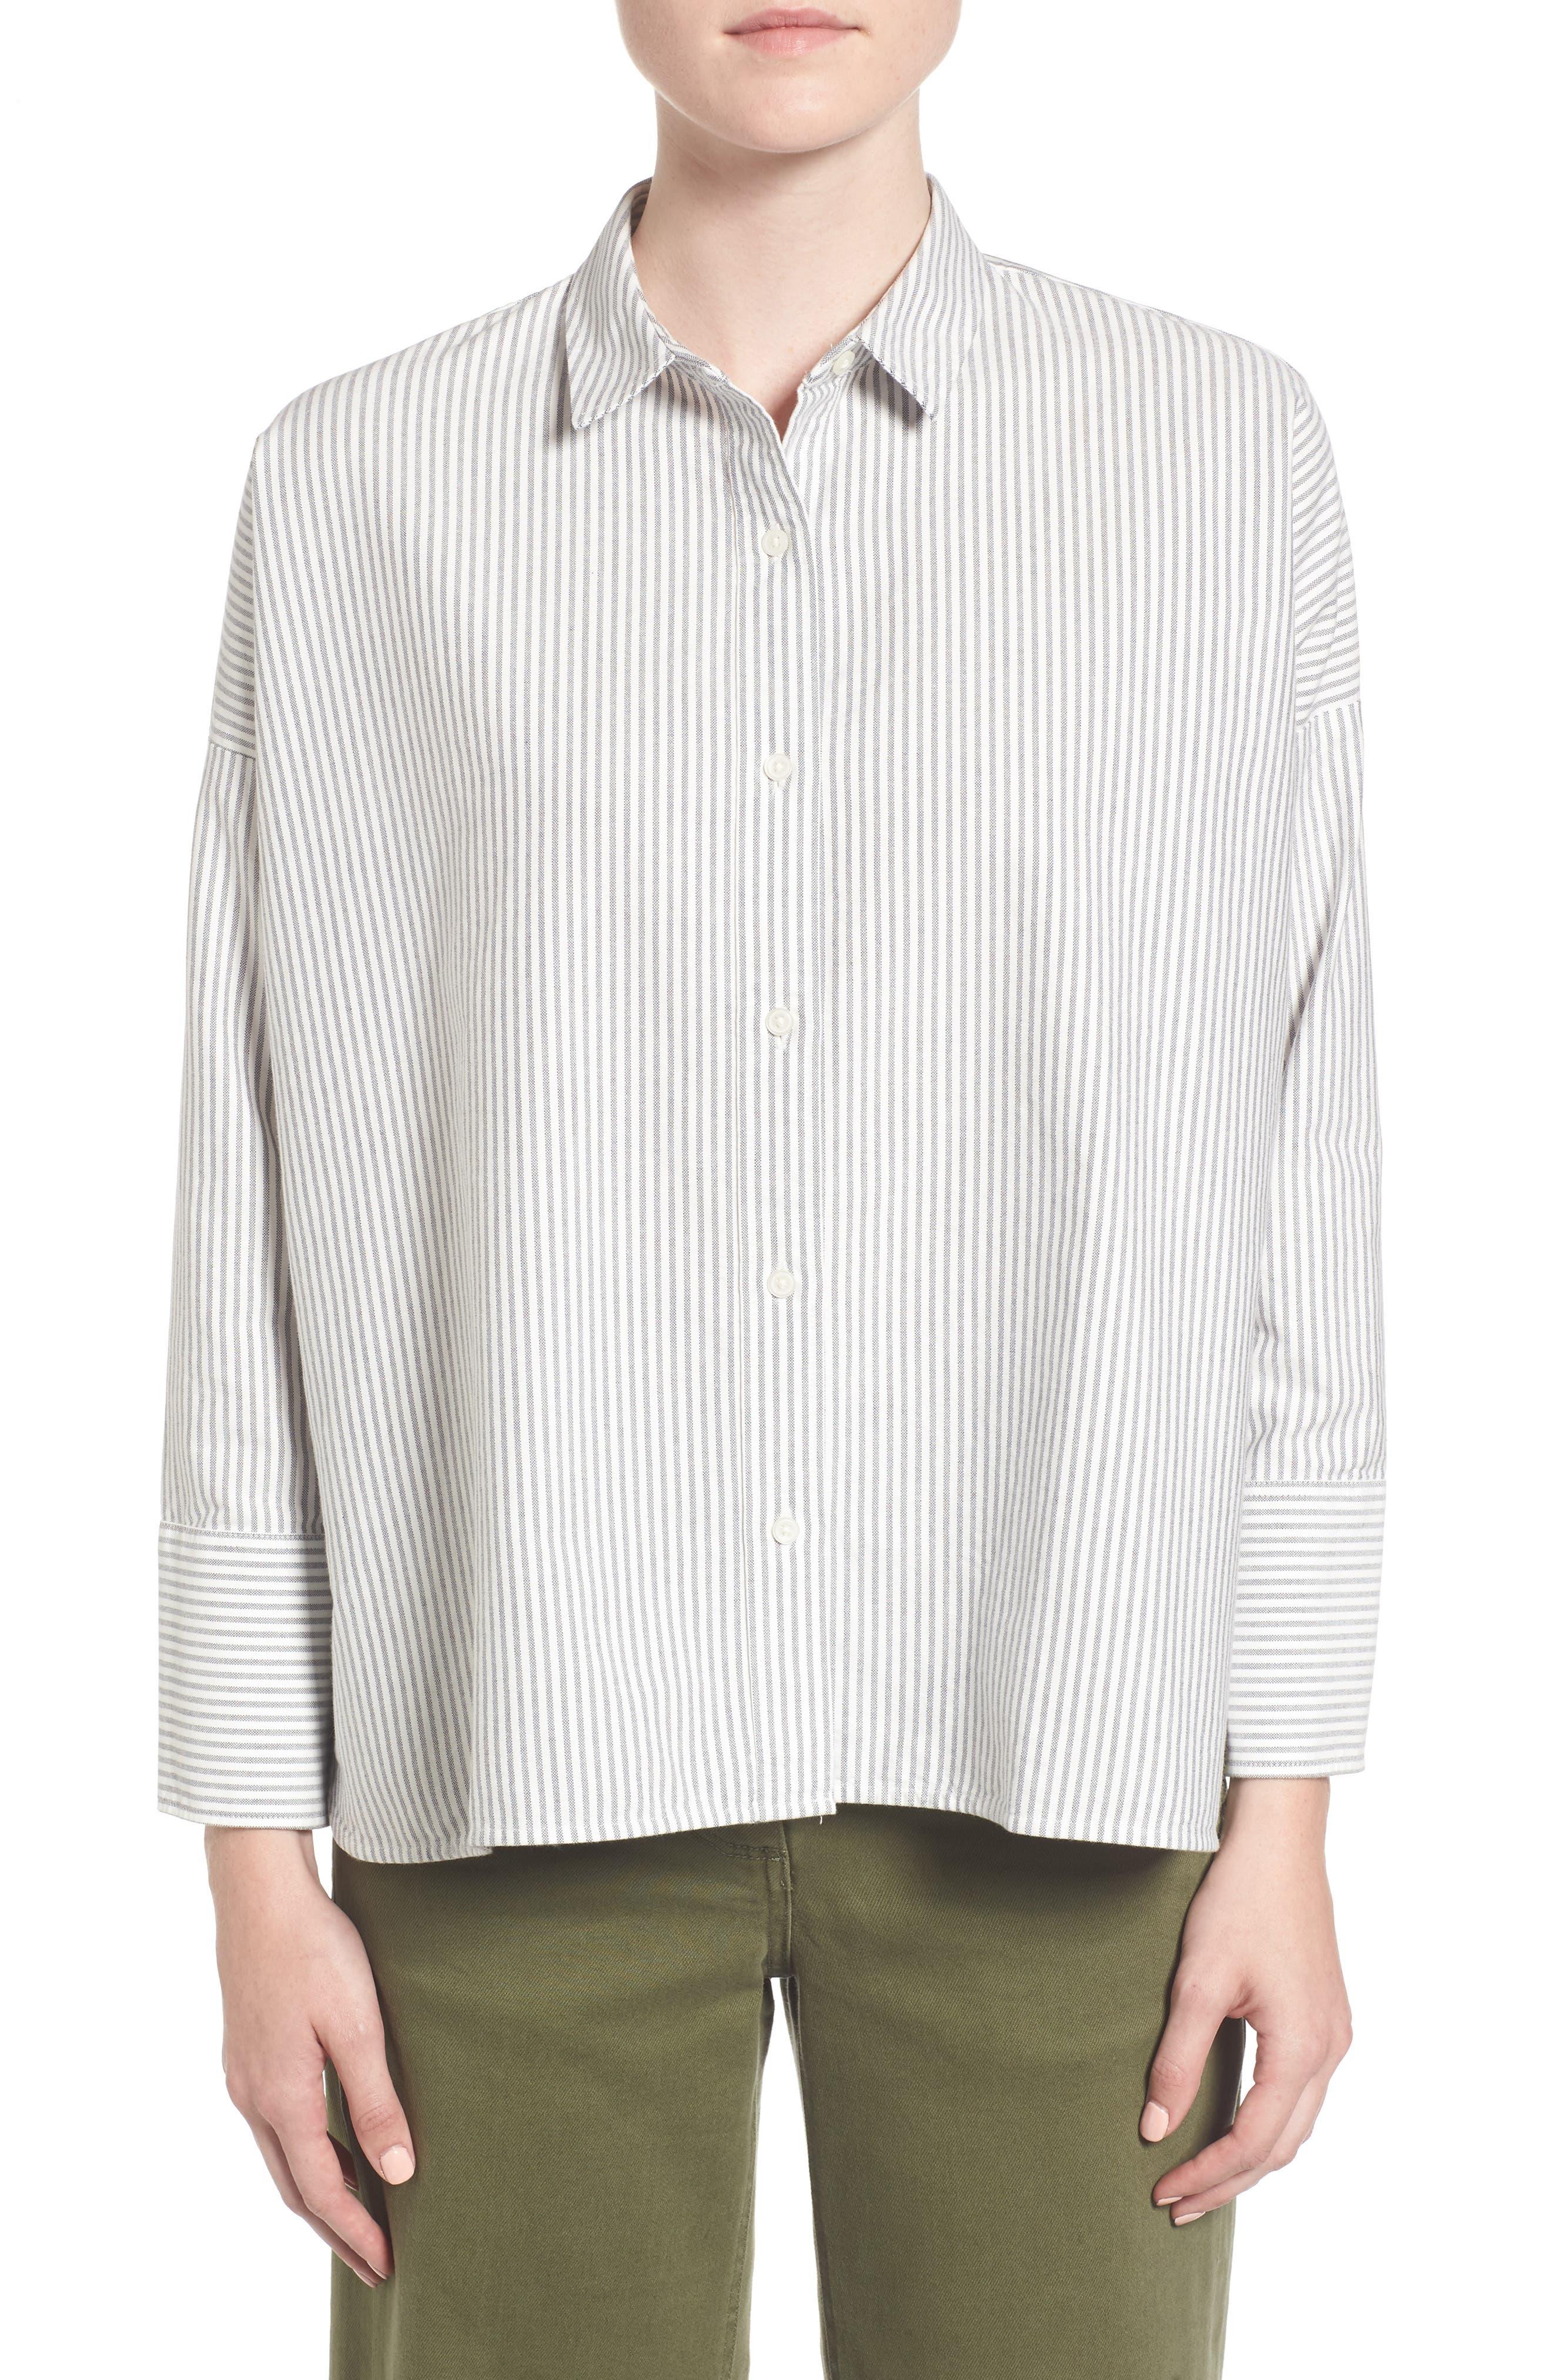 Main Image - Everlane The Japanese Oxford Square Shirt